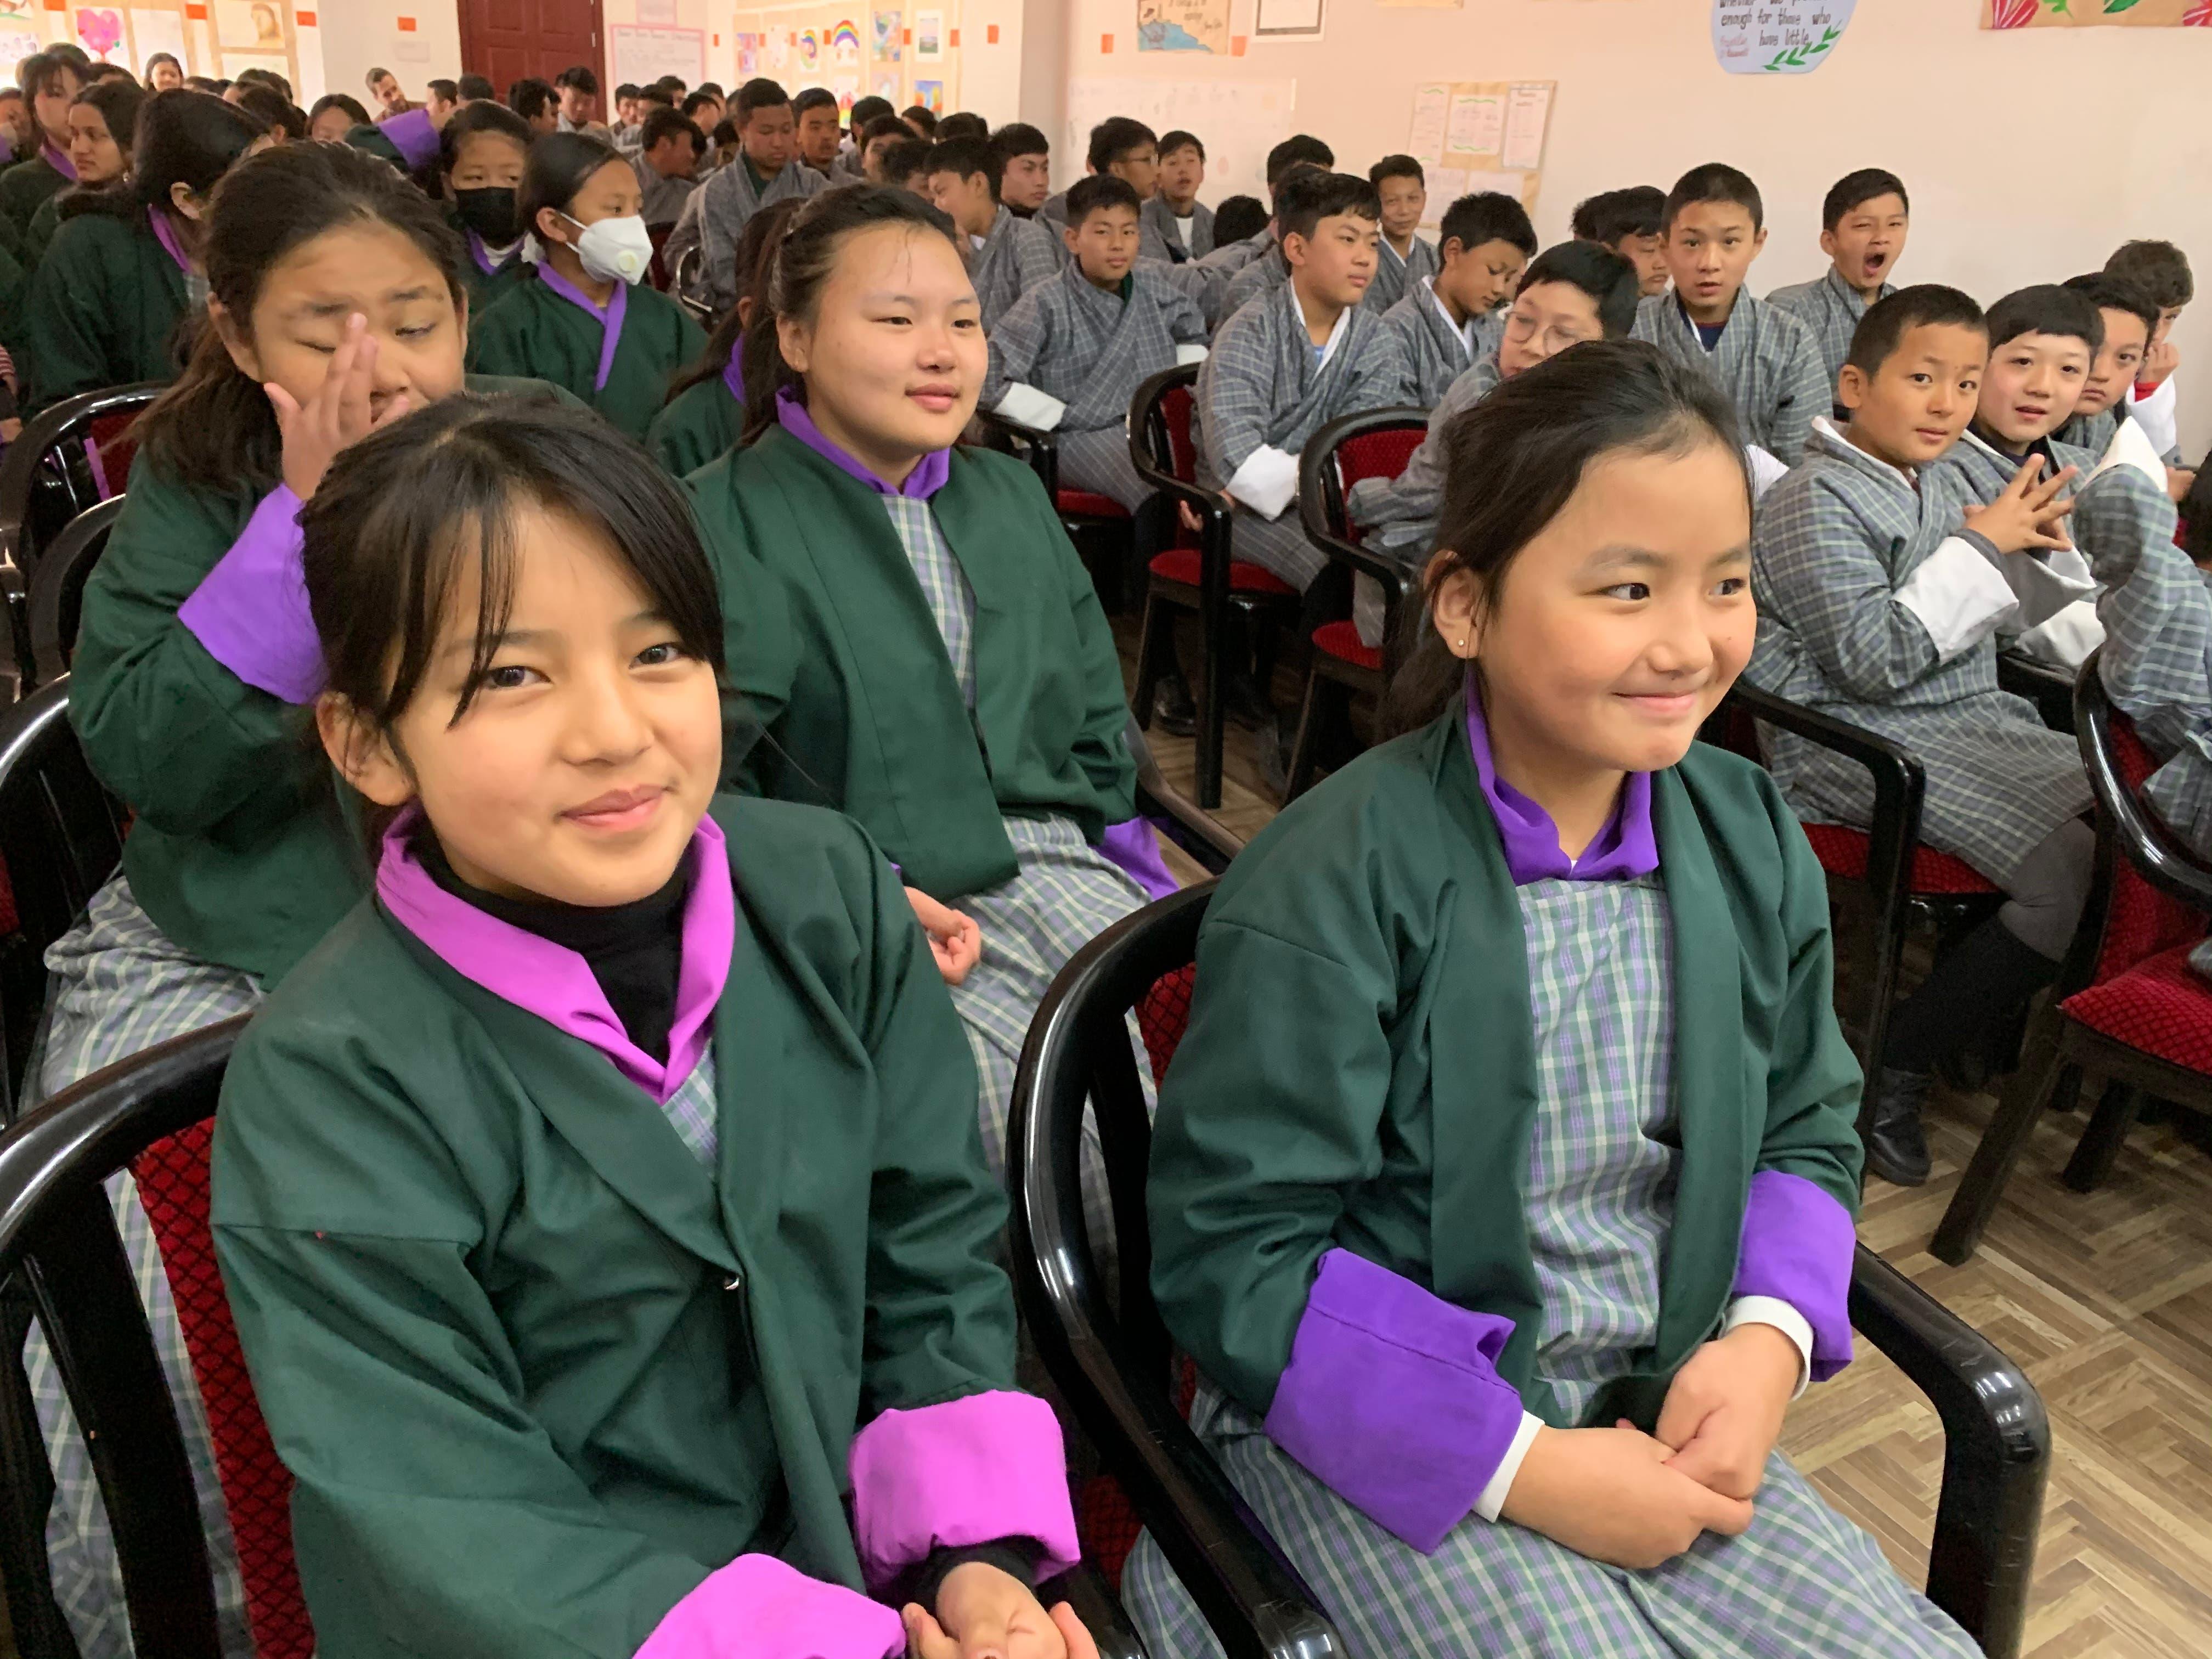 Die bhutanischen Schüler bei der Begrüssung der Alpenquai-Schüler.